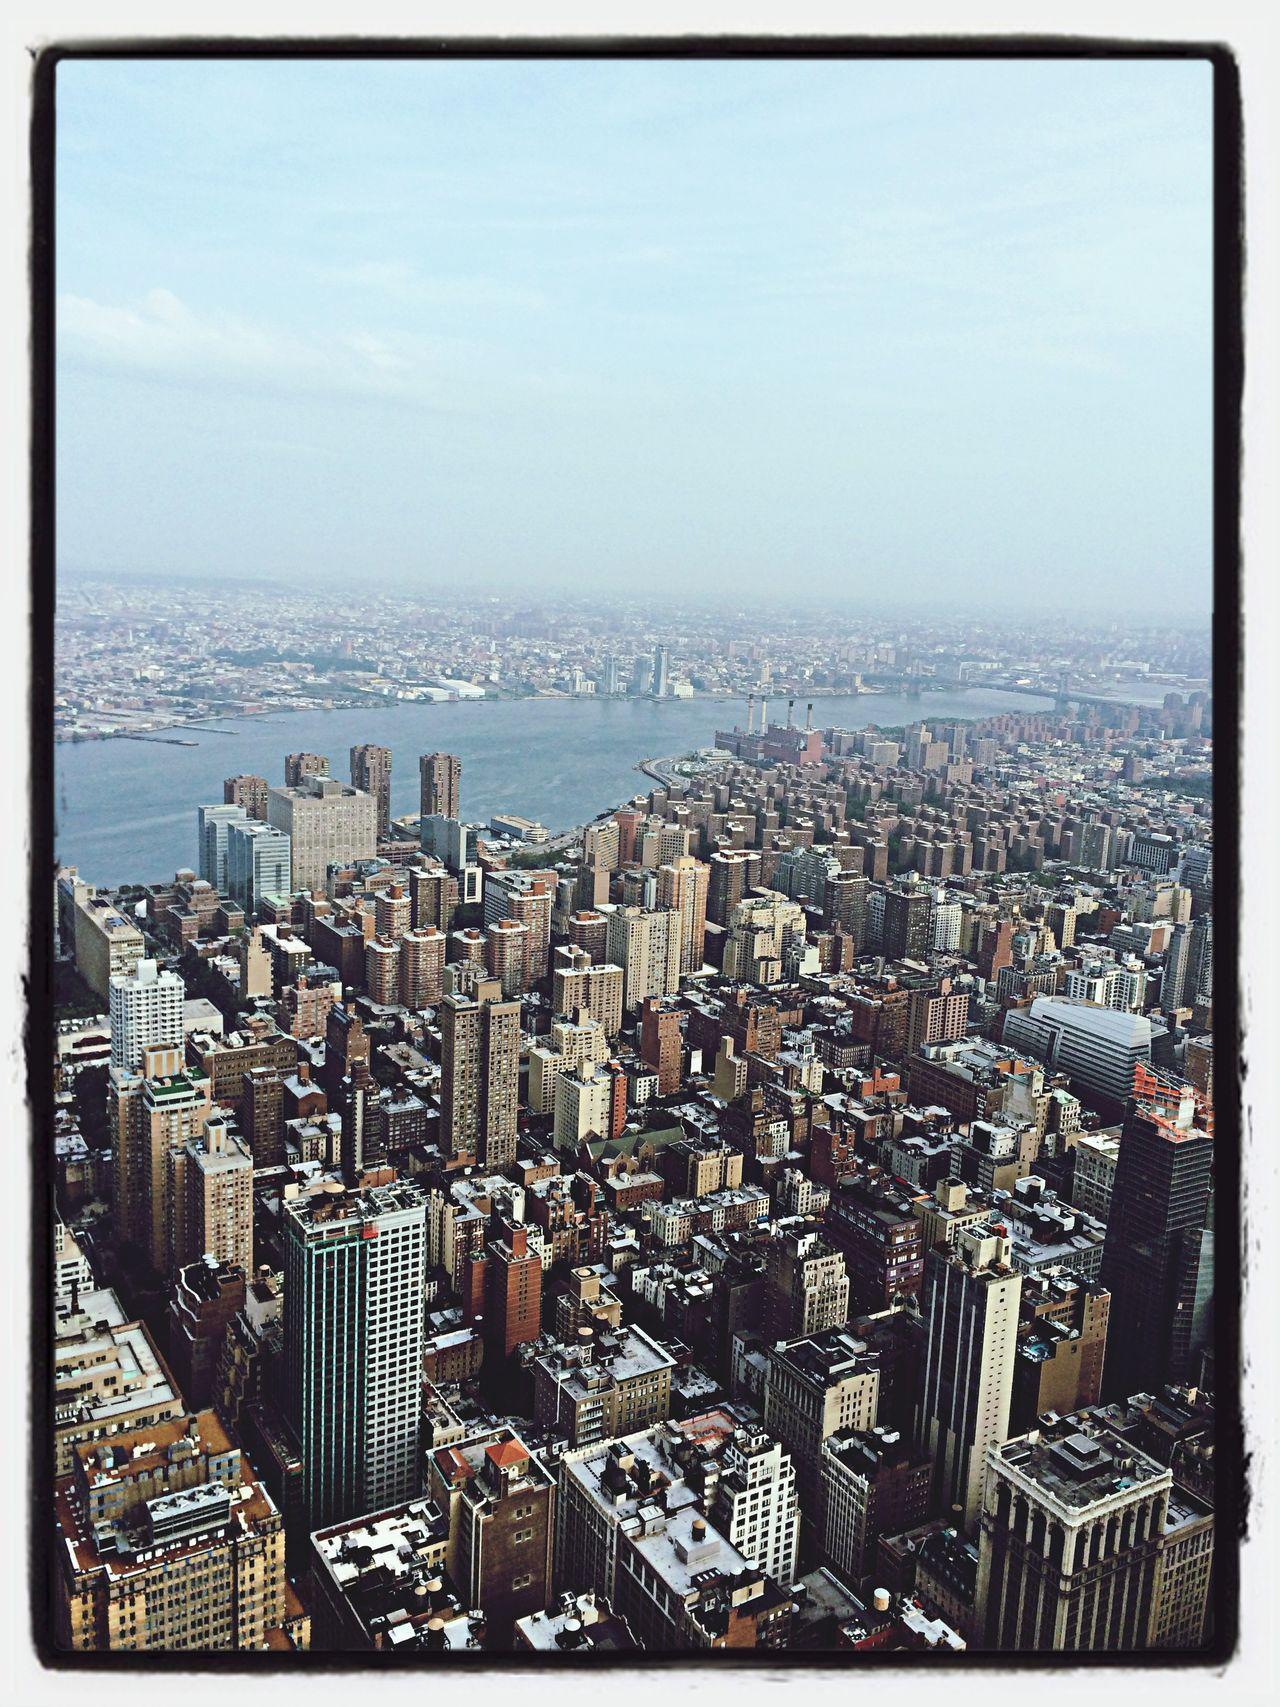 Newyorkcity Manhattan Traveling Fromempirestatebuilding